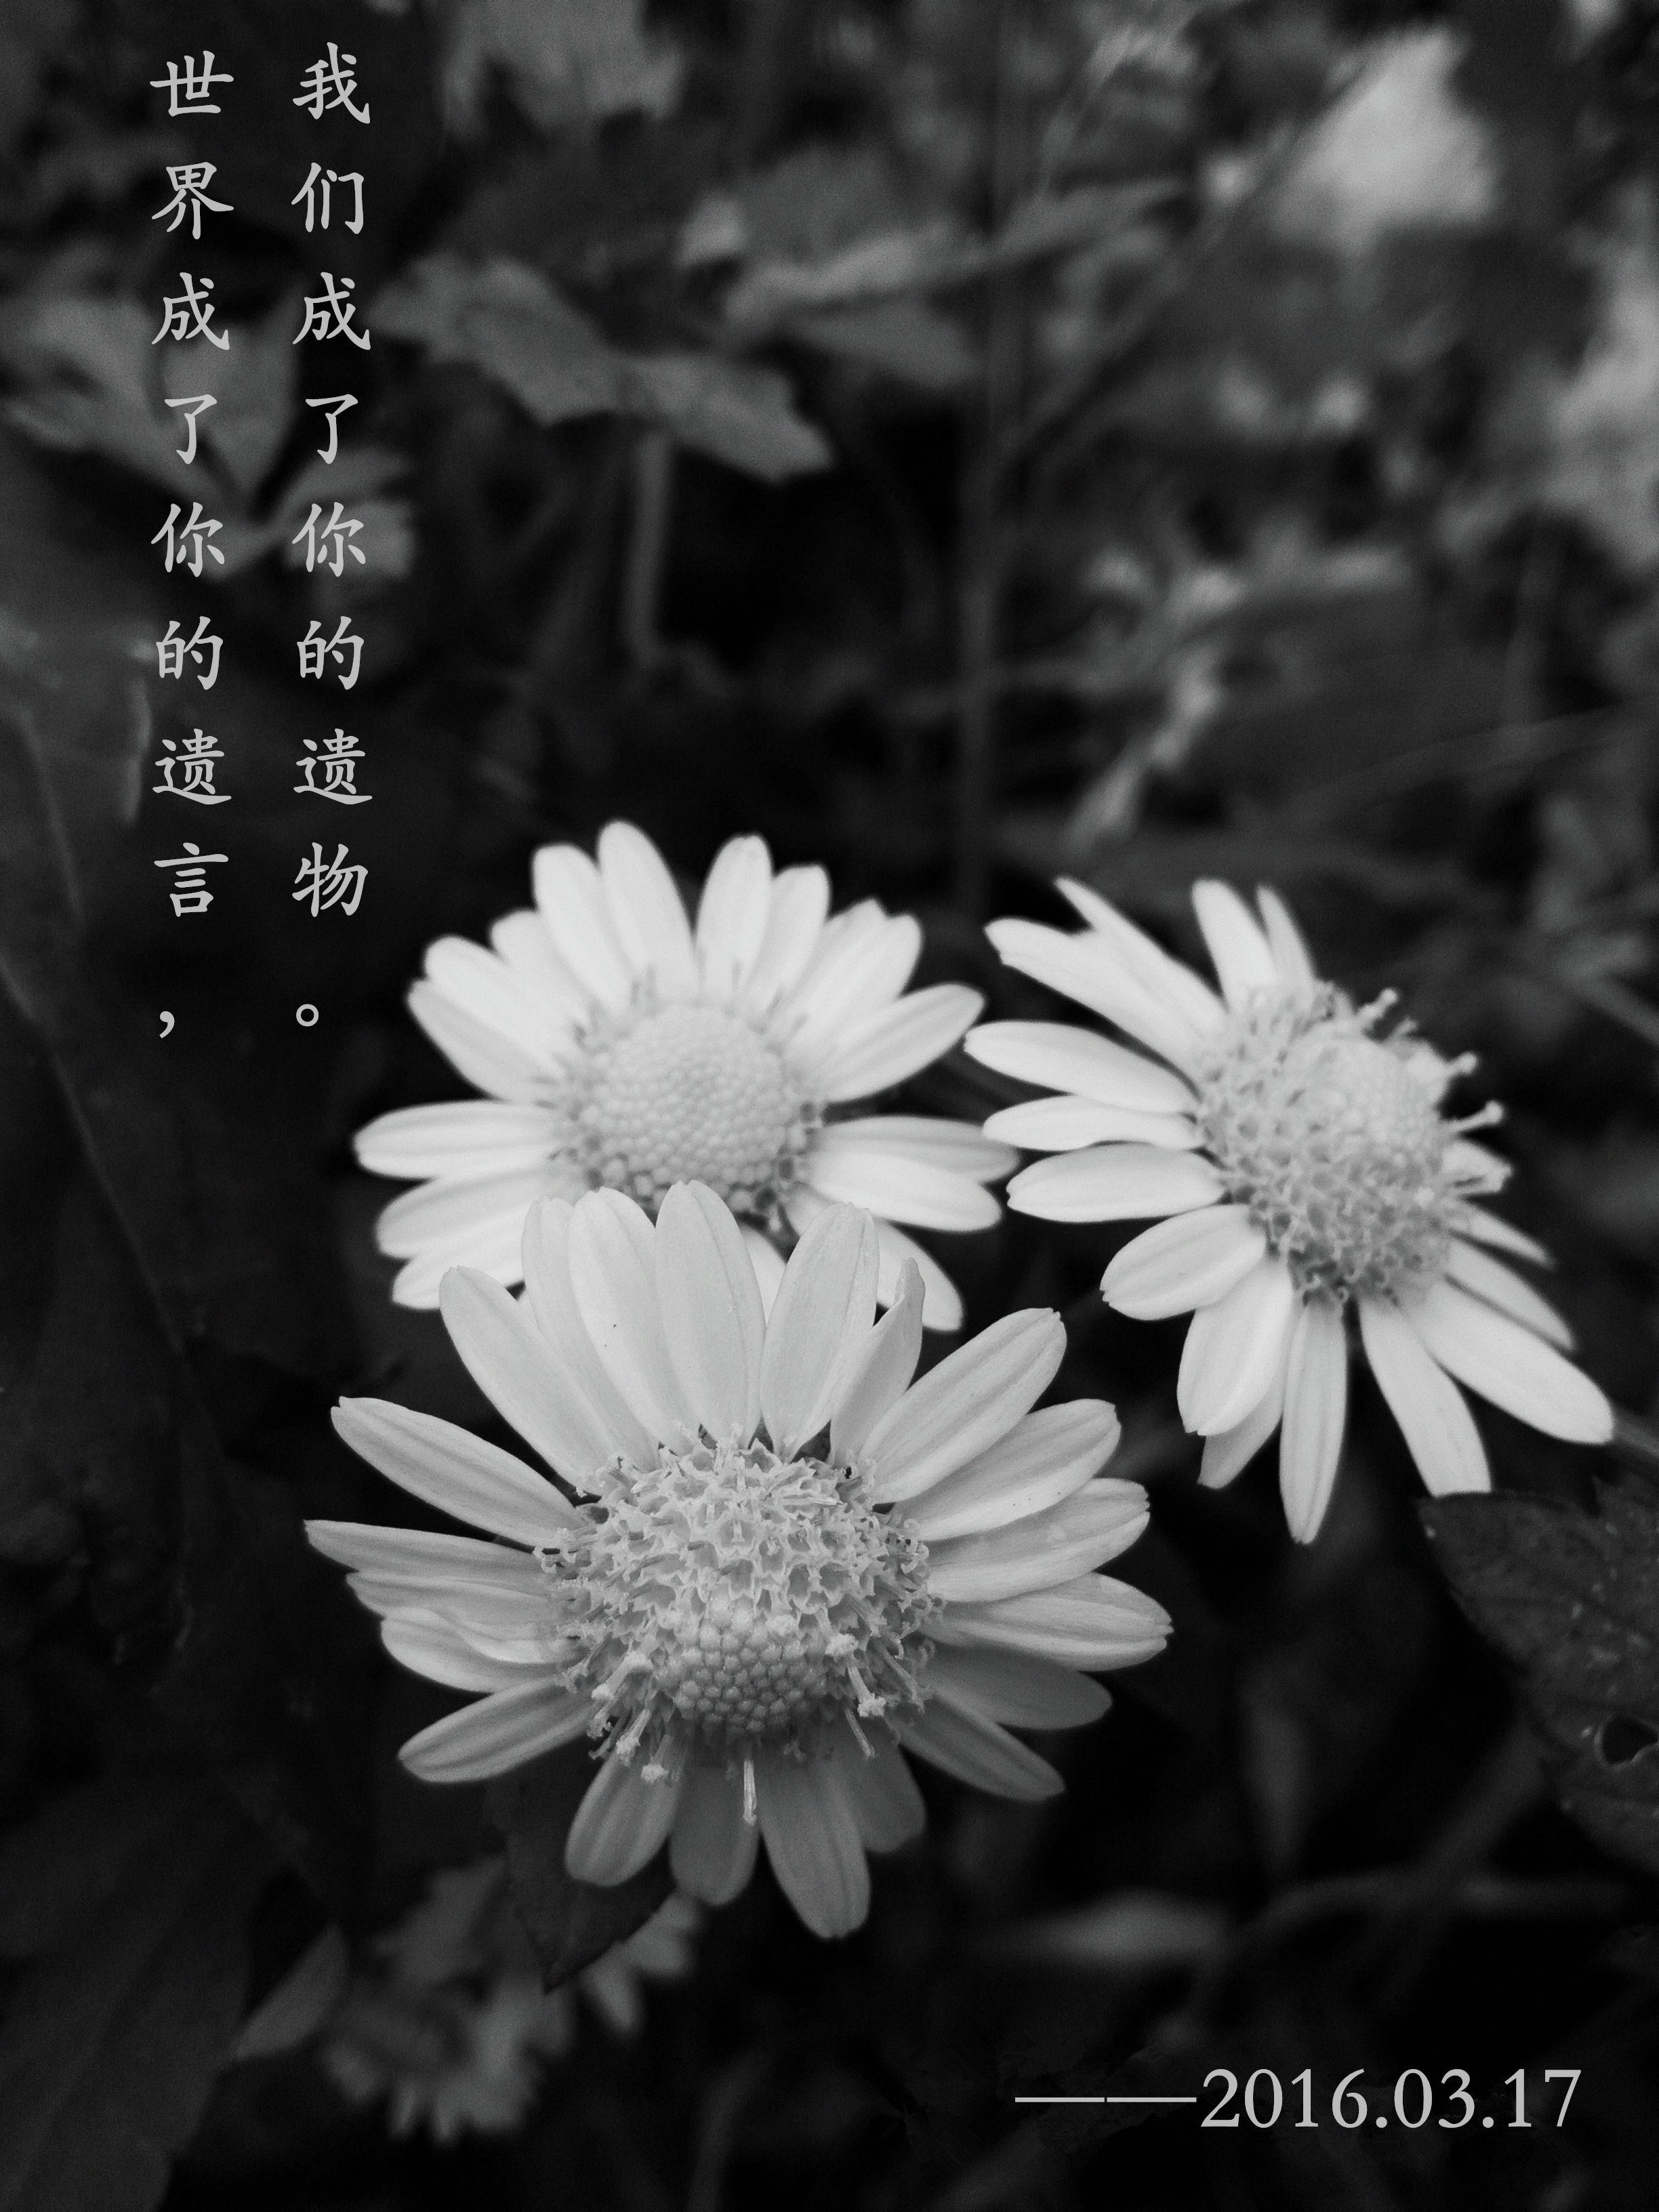 Chrysanthemum Chrysanthemum Flowers World